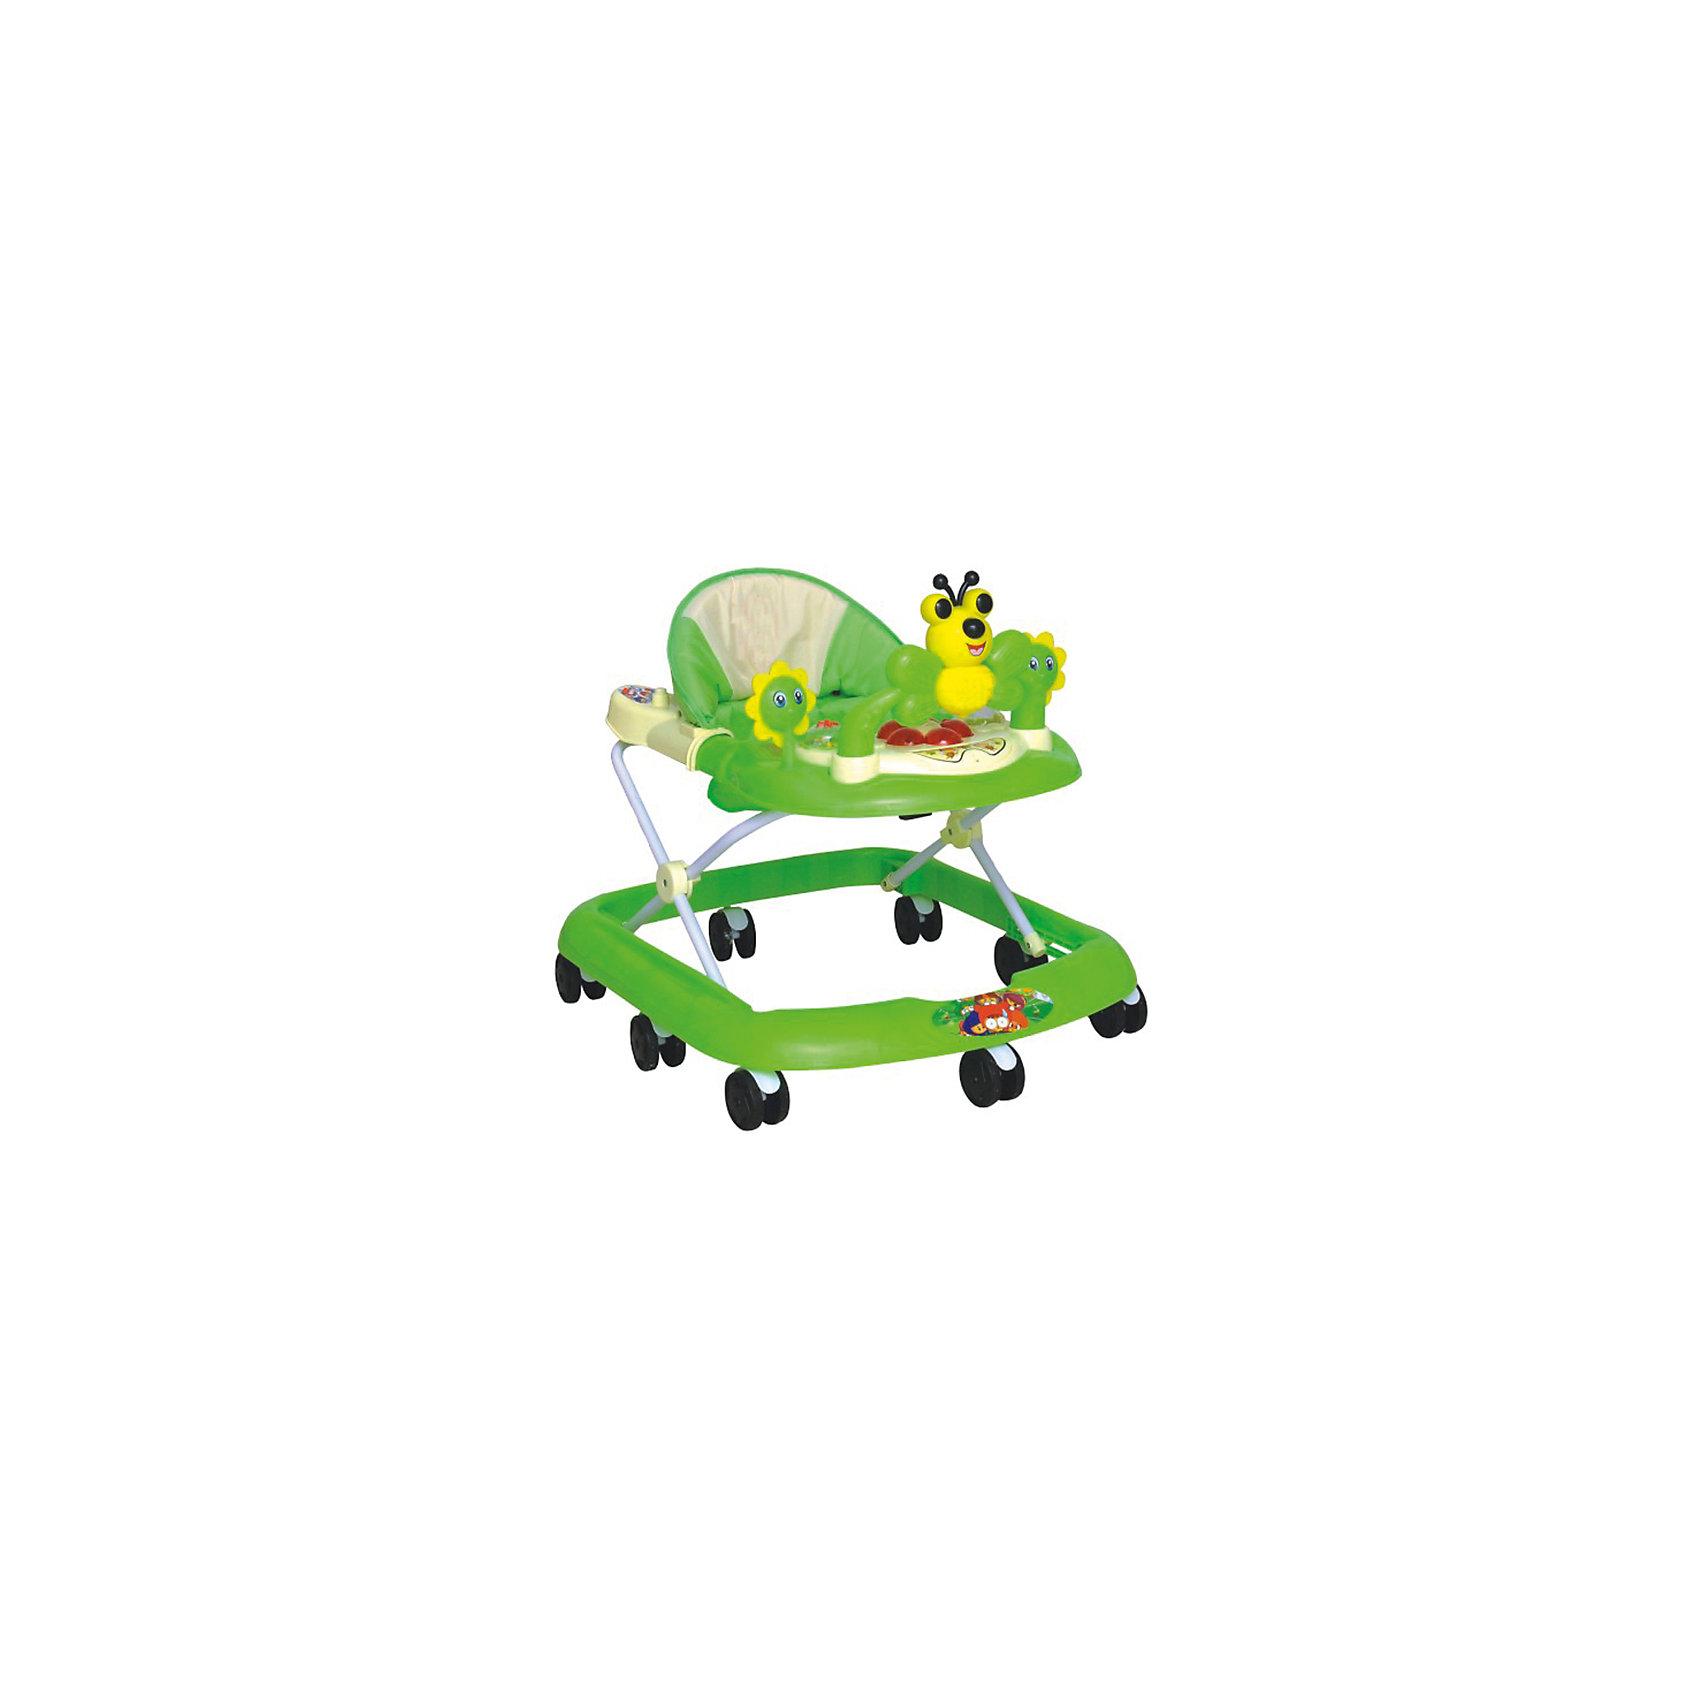 Ходунки Бабочка, Shine Ring, зеленыйХодунки<br>SHINE RING  Ходунки (8 колес,игрушки,муз) 5 шт в кор.(67*60*52), GREEN/ Зеленый<br><br>Ширина мм: 670<br>Глубина мм: 600<br>Высота мм: 520<br>Вес г: 3600<br>Возраст от месяцев: 6<br>Возраст до месяцев: 12<br>Пол: Унисекс<br>Возраст: Детский<br>SKU: 5559217